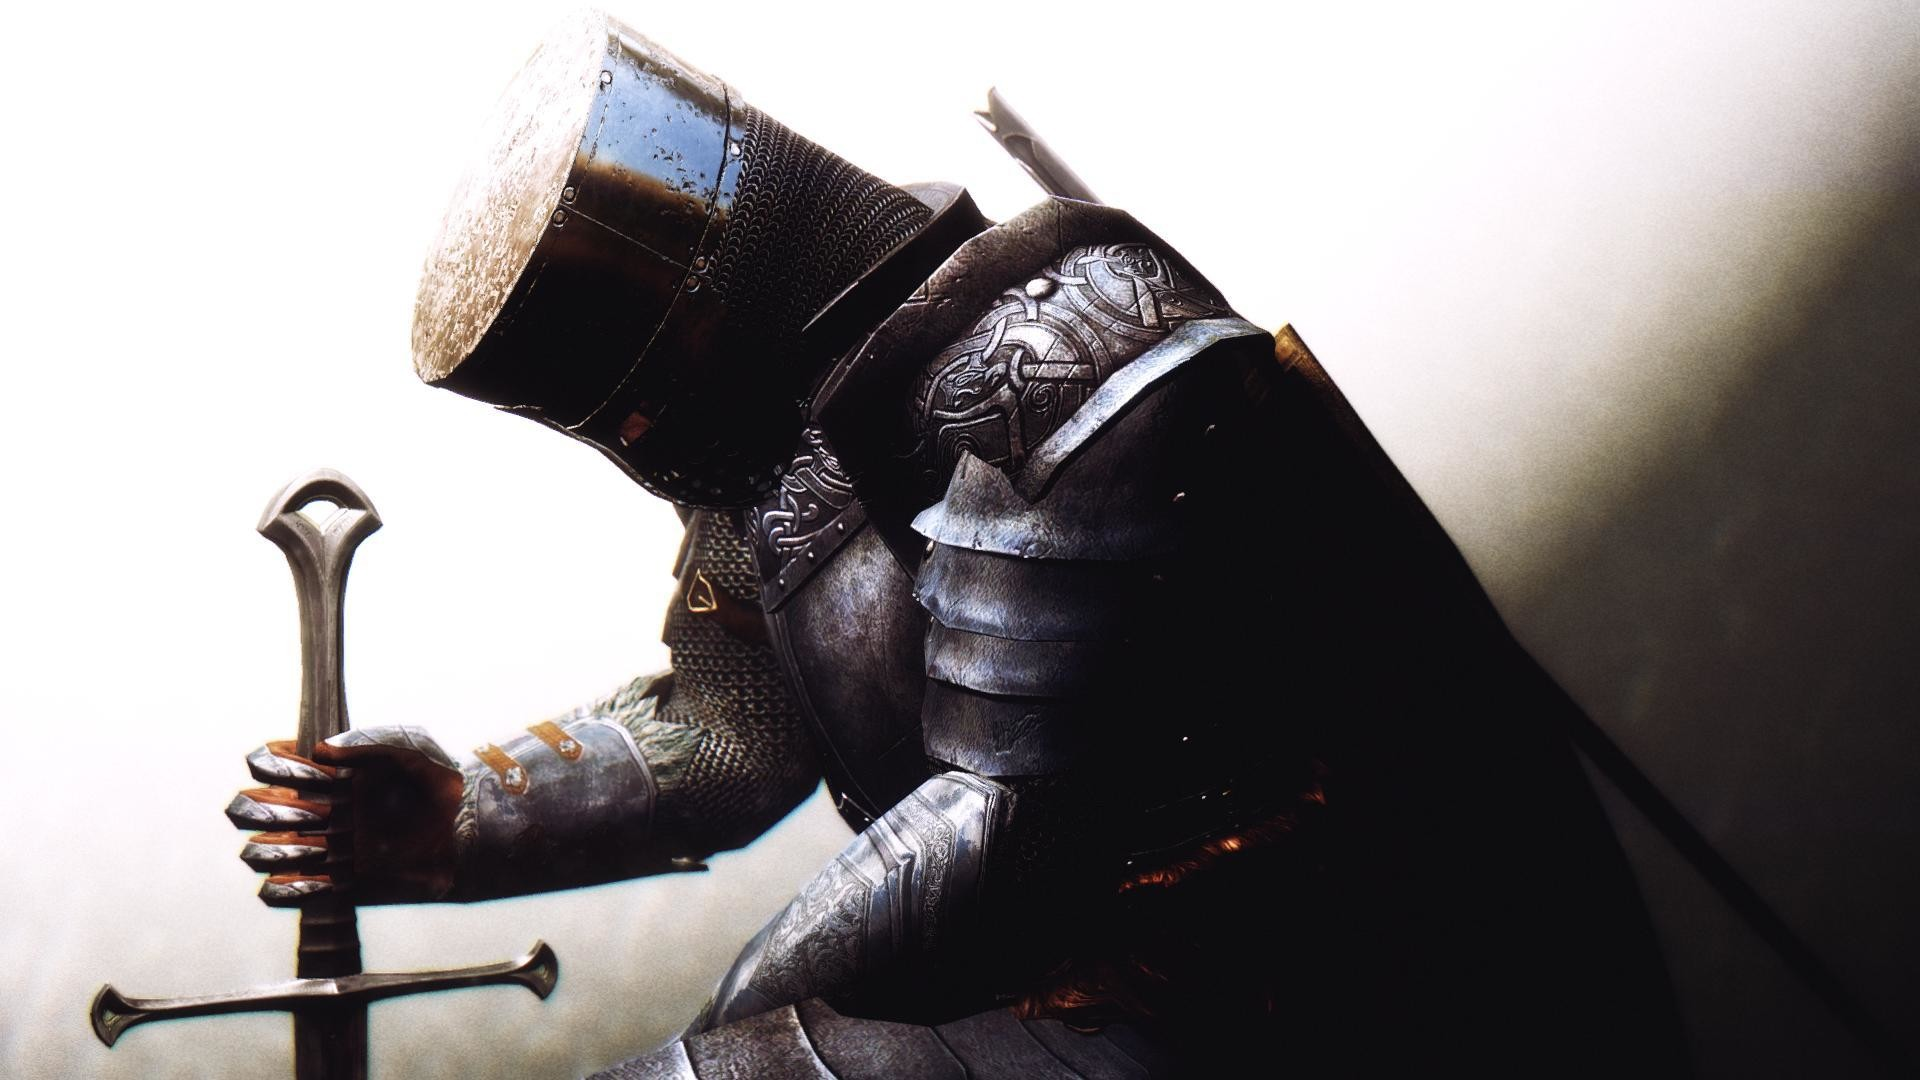 Knight Images On Wallpaper Hd 1920 x 1080 px 623.08 KB medieval black  battle crusader